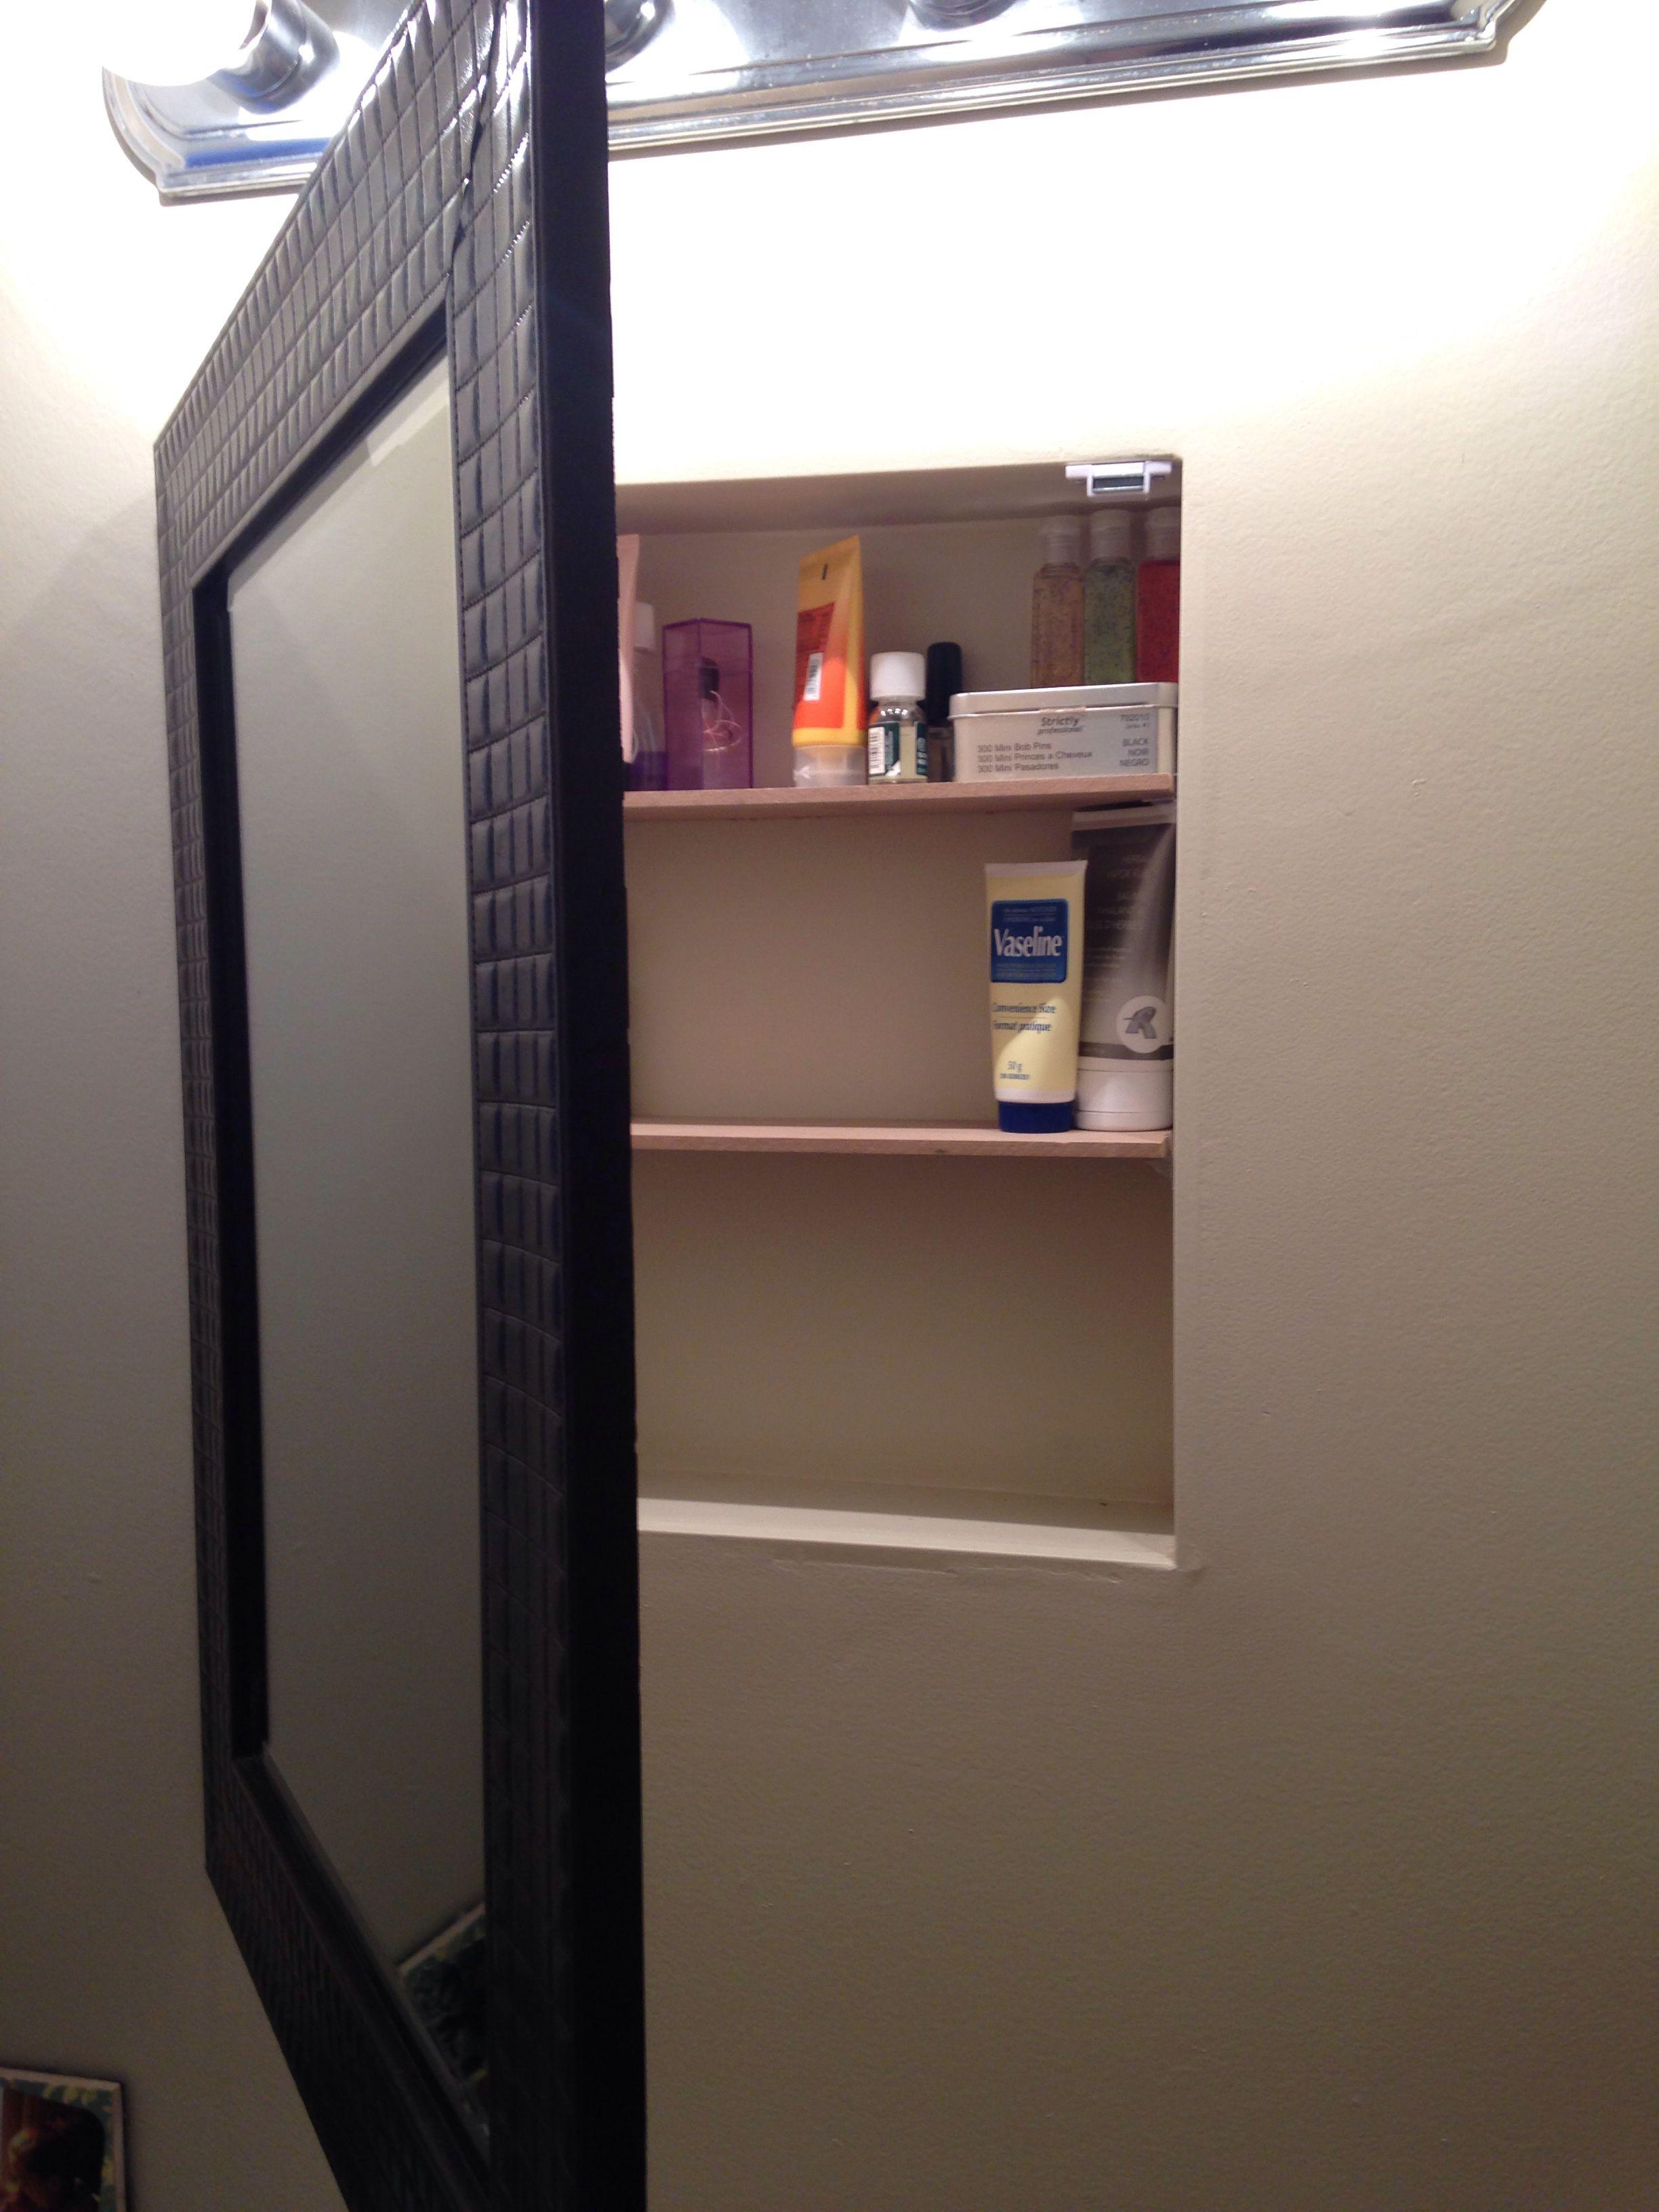 Medicine Cabinet Magnet Diy Medicine Cabinet Removed Old Medicine Cabinet From The Wall